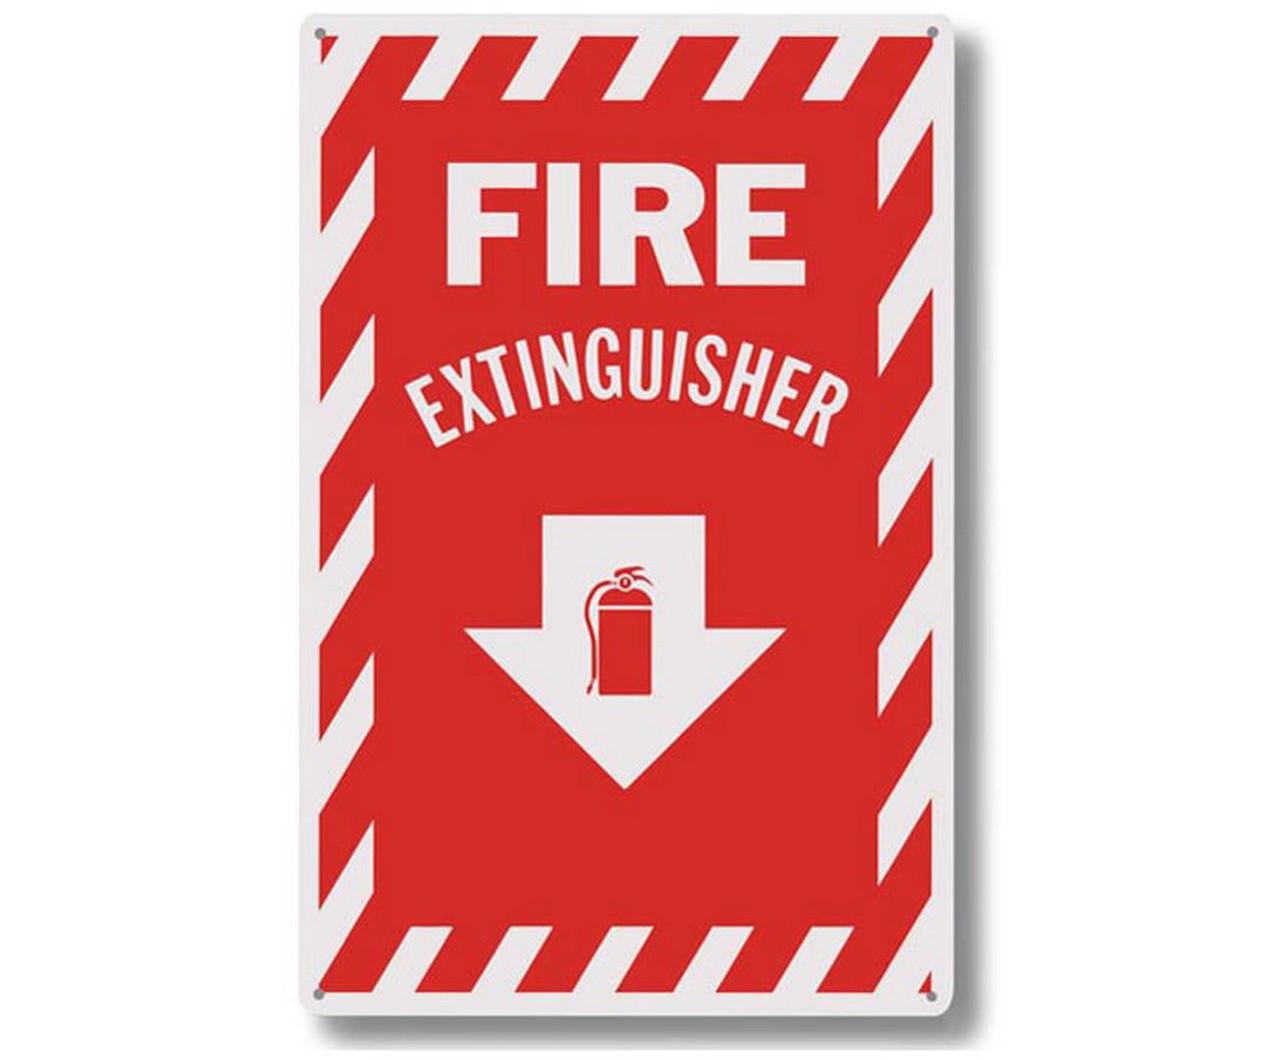 "A114 Aluminum Fire Extinguisher Sign 8"" x 12"""